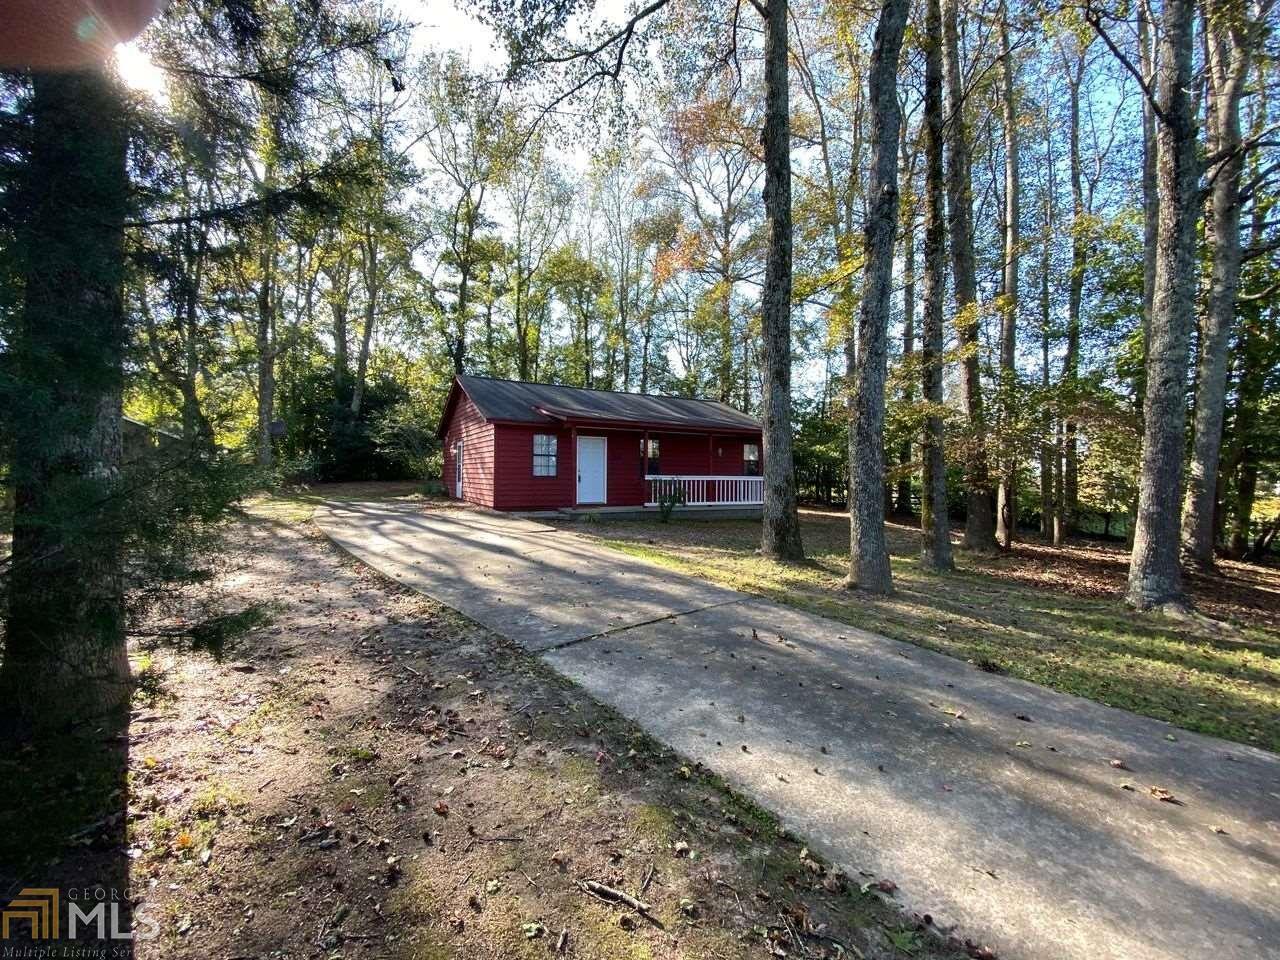 1455 Ridge Rd, Lawrenceville, GA 30043 - MLS#: 8883706